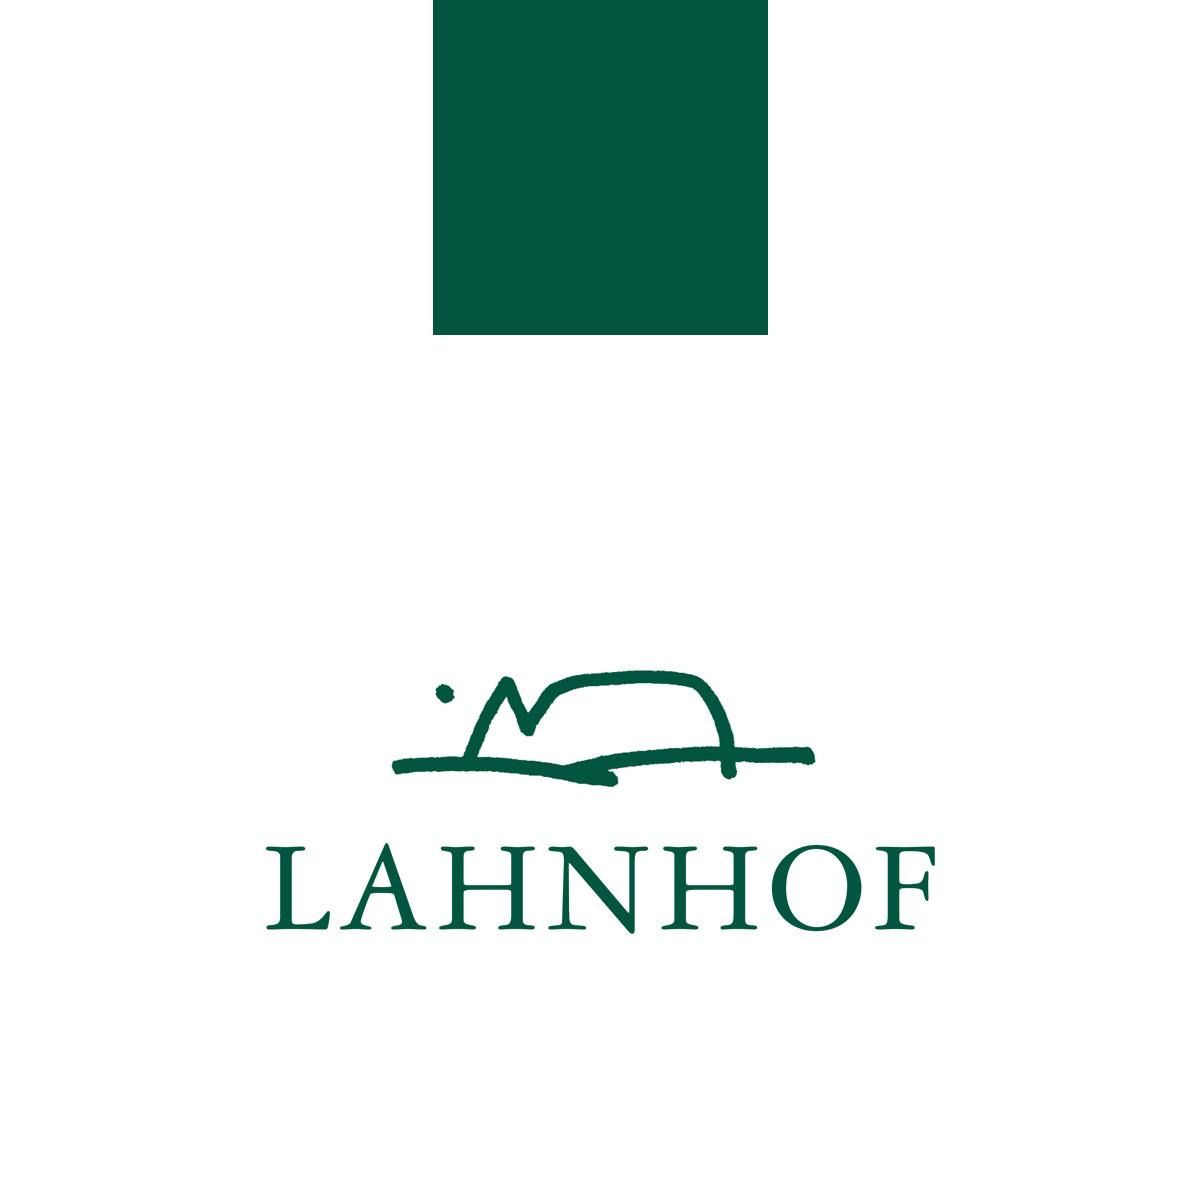 lahnhof